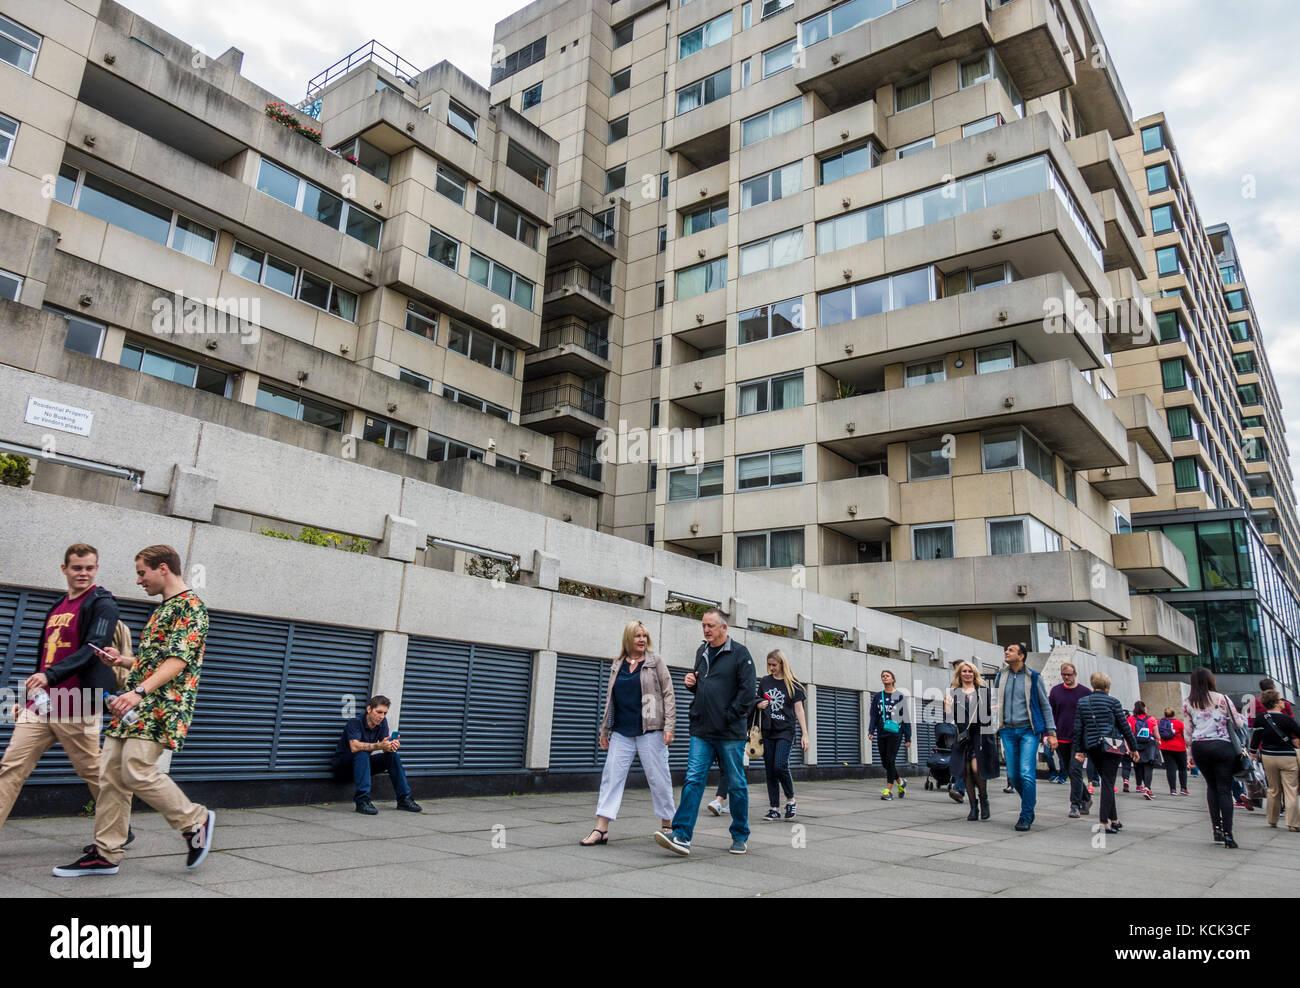 People walking past old concrete apartment blocks, facing the River Thames on Bankside, London, England, UK. - Stock Image